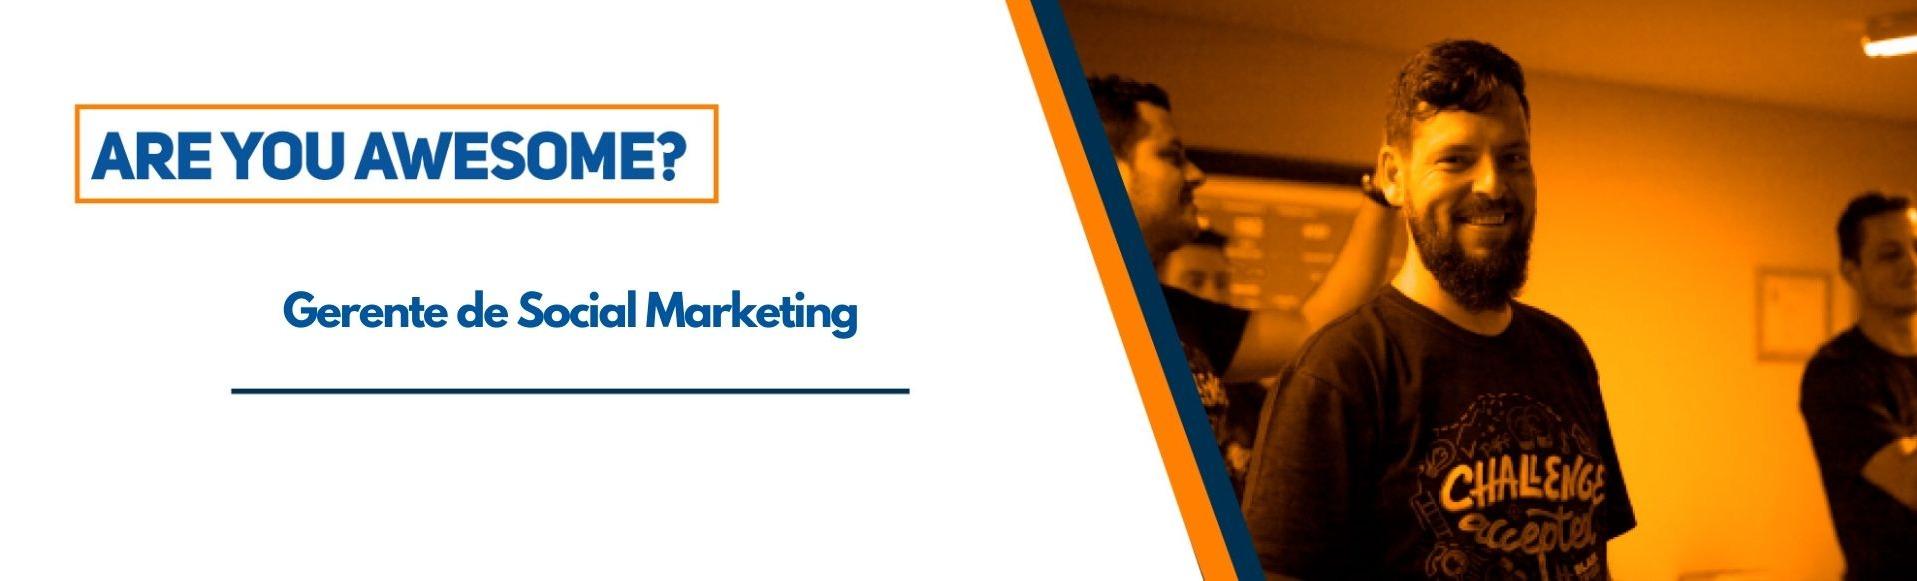 Gerente de Social Marketing